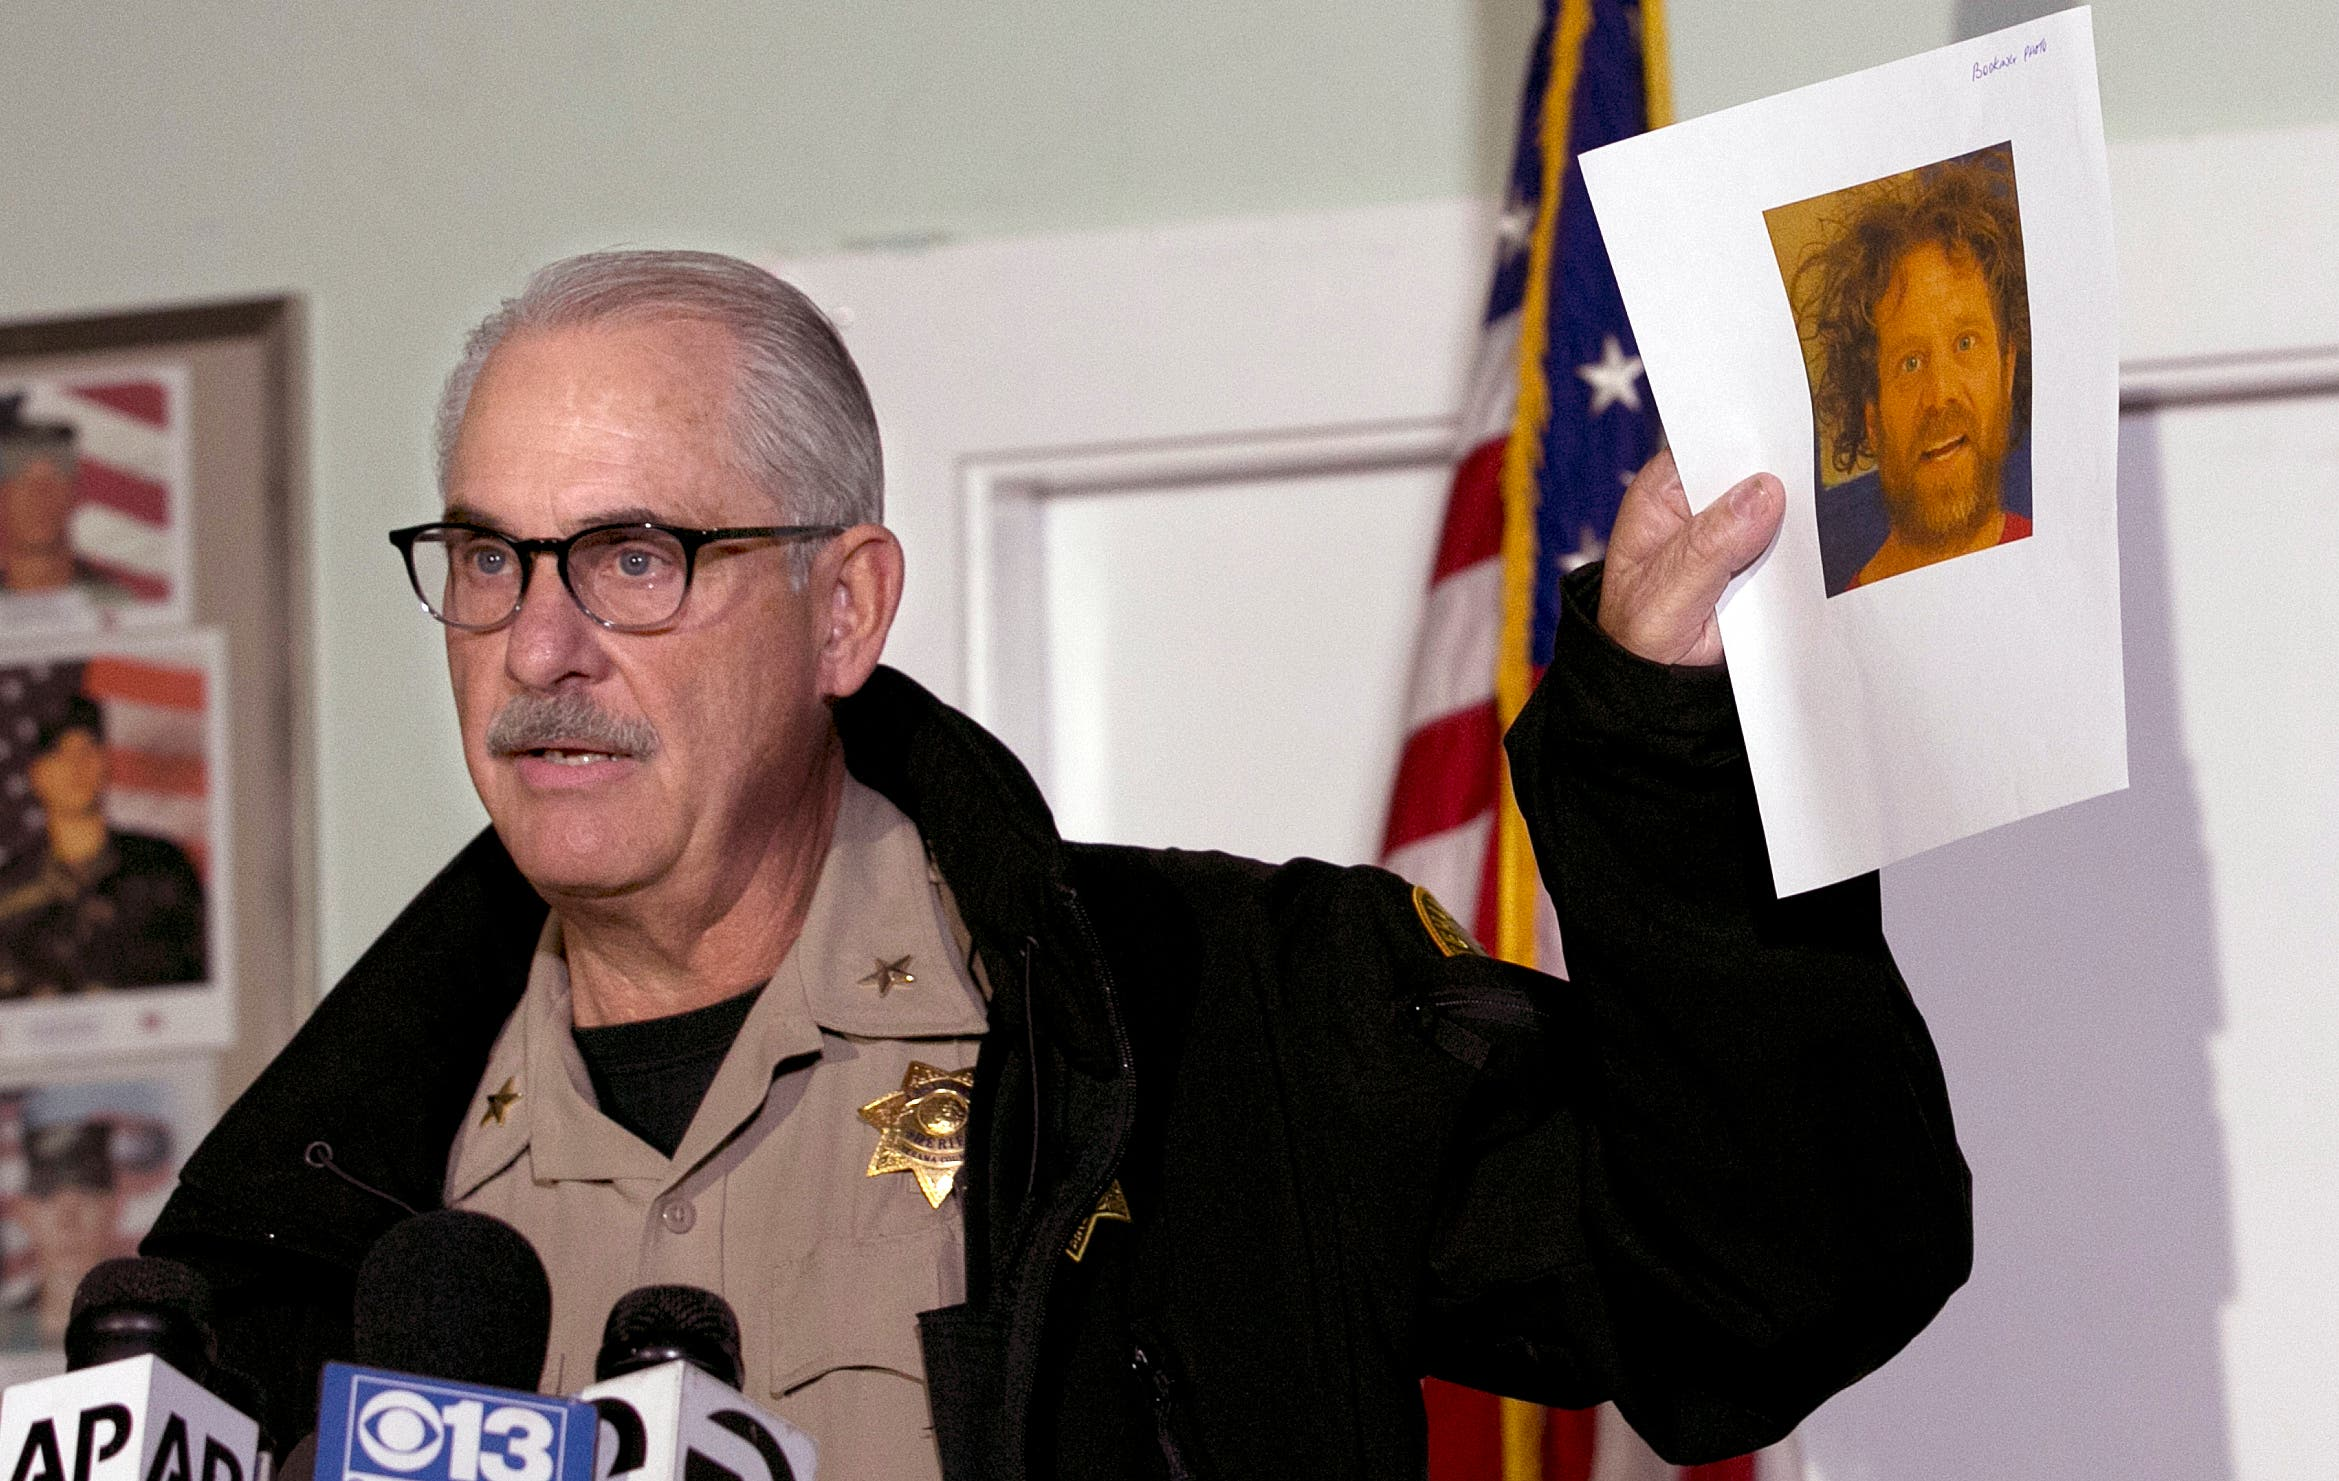 Asesino de California mató a su esposa horas antes de tiroteo cerca de colegio